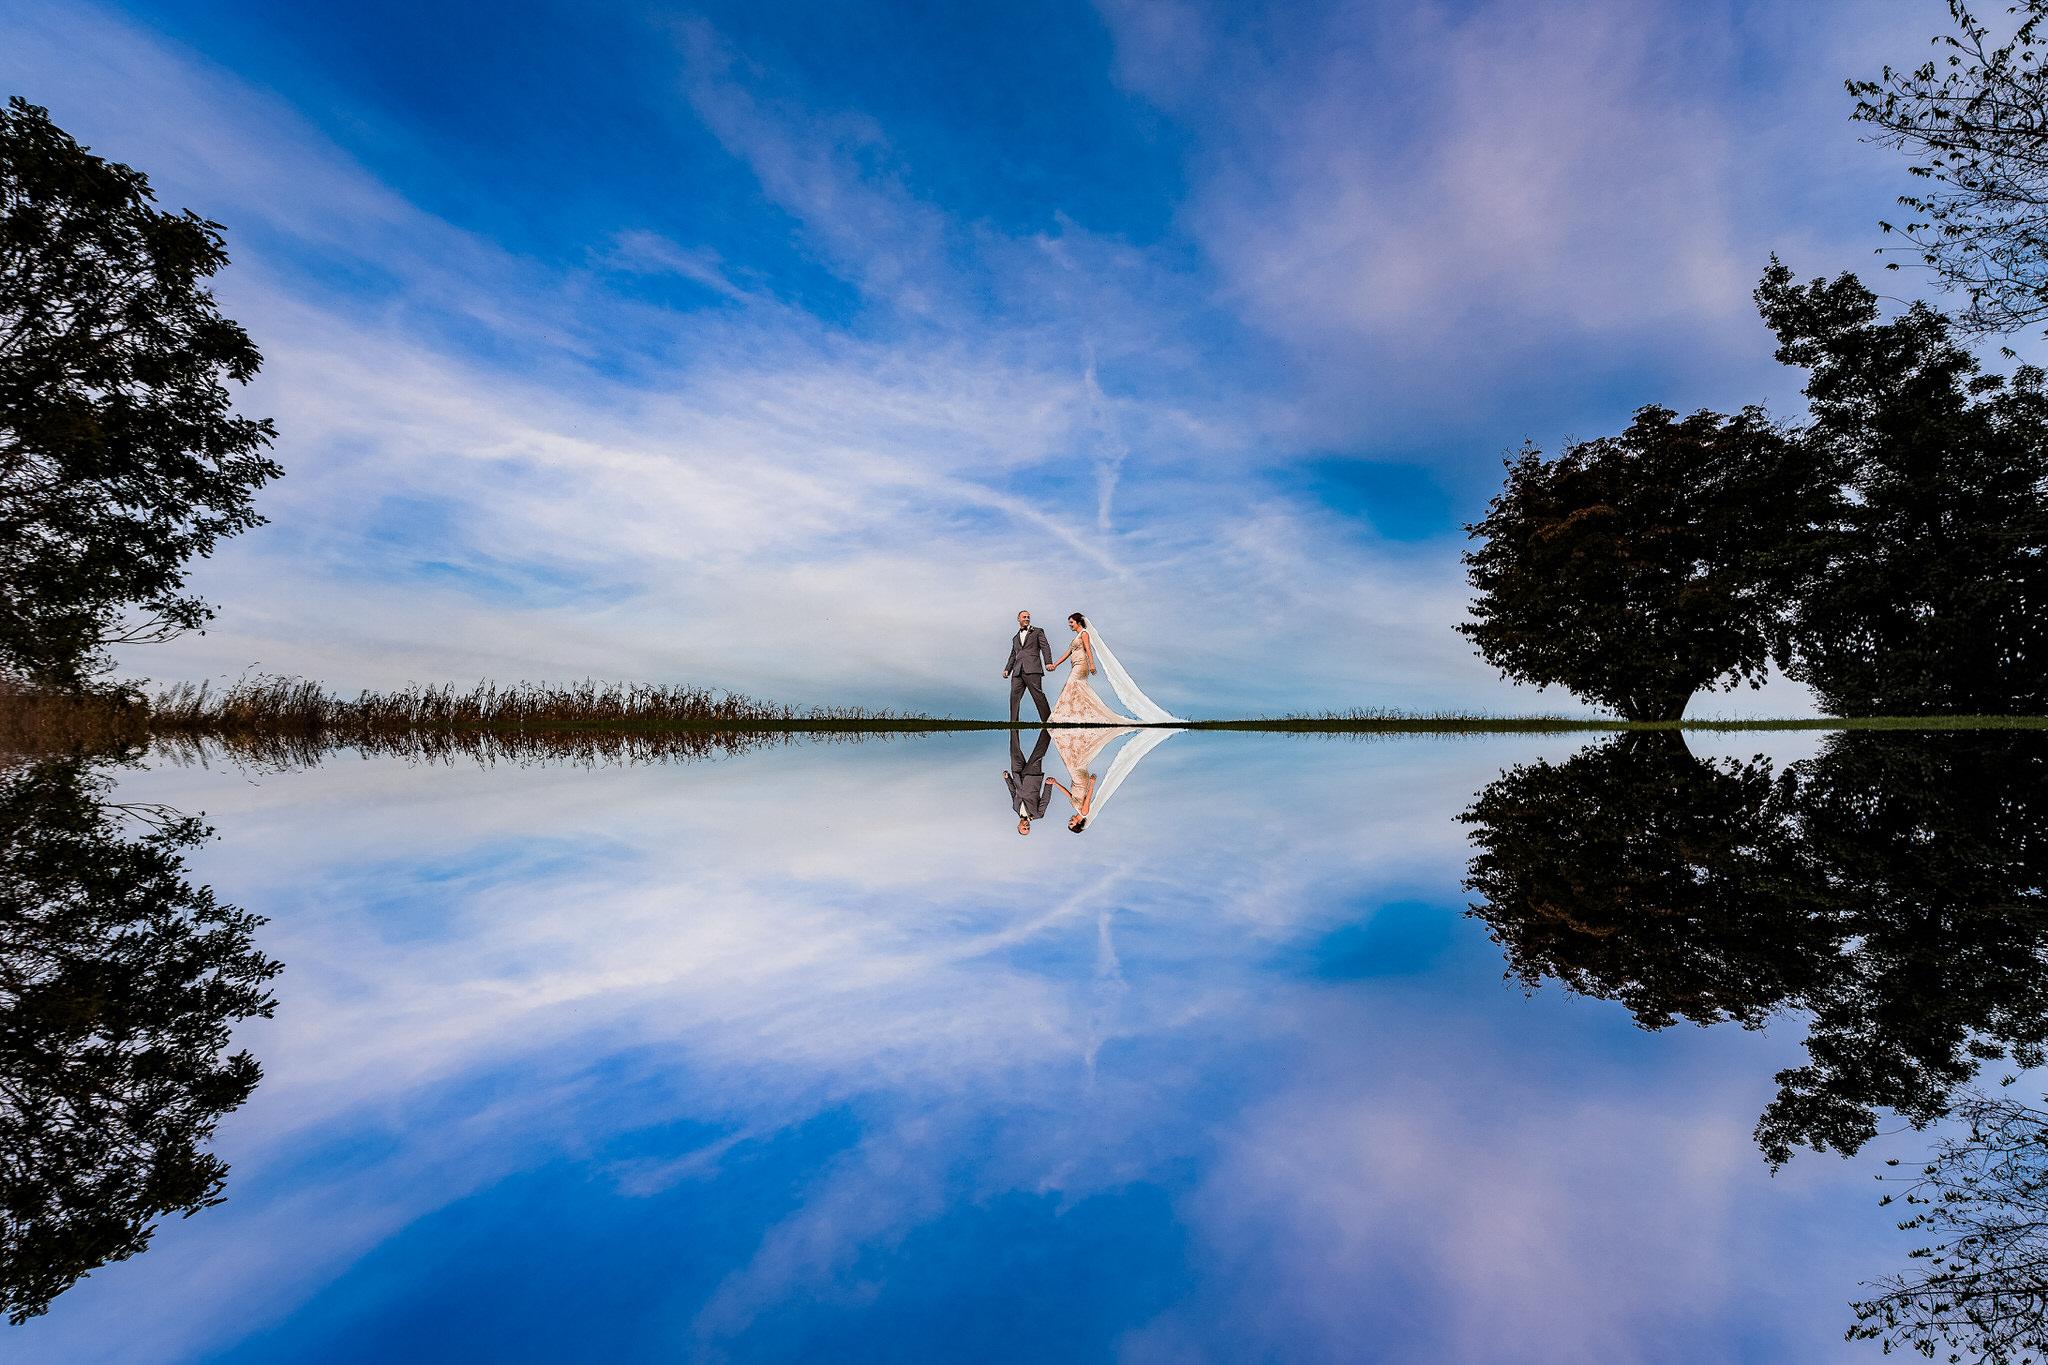 SMJ Photography, Wedding Photography, Reflection Wedding Photo, Lake Reflection, Husband and Wife Reflection Photo